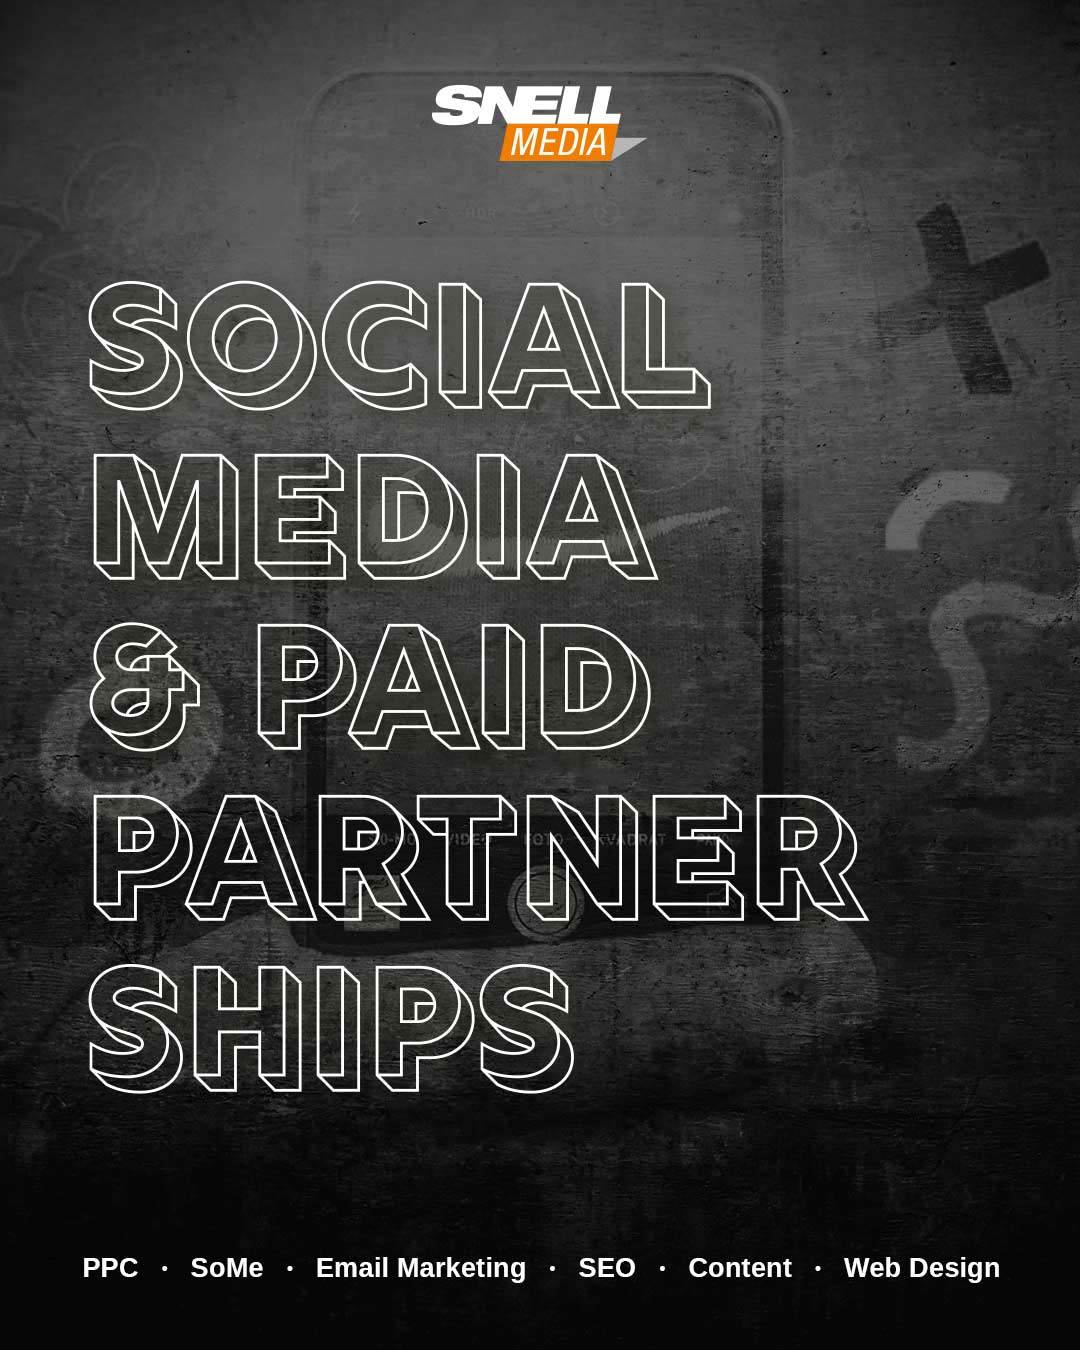 Social Media Retargeting & Paid Partnerships 2nd B2B Digital Marketing Trend